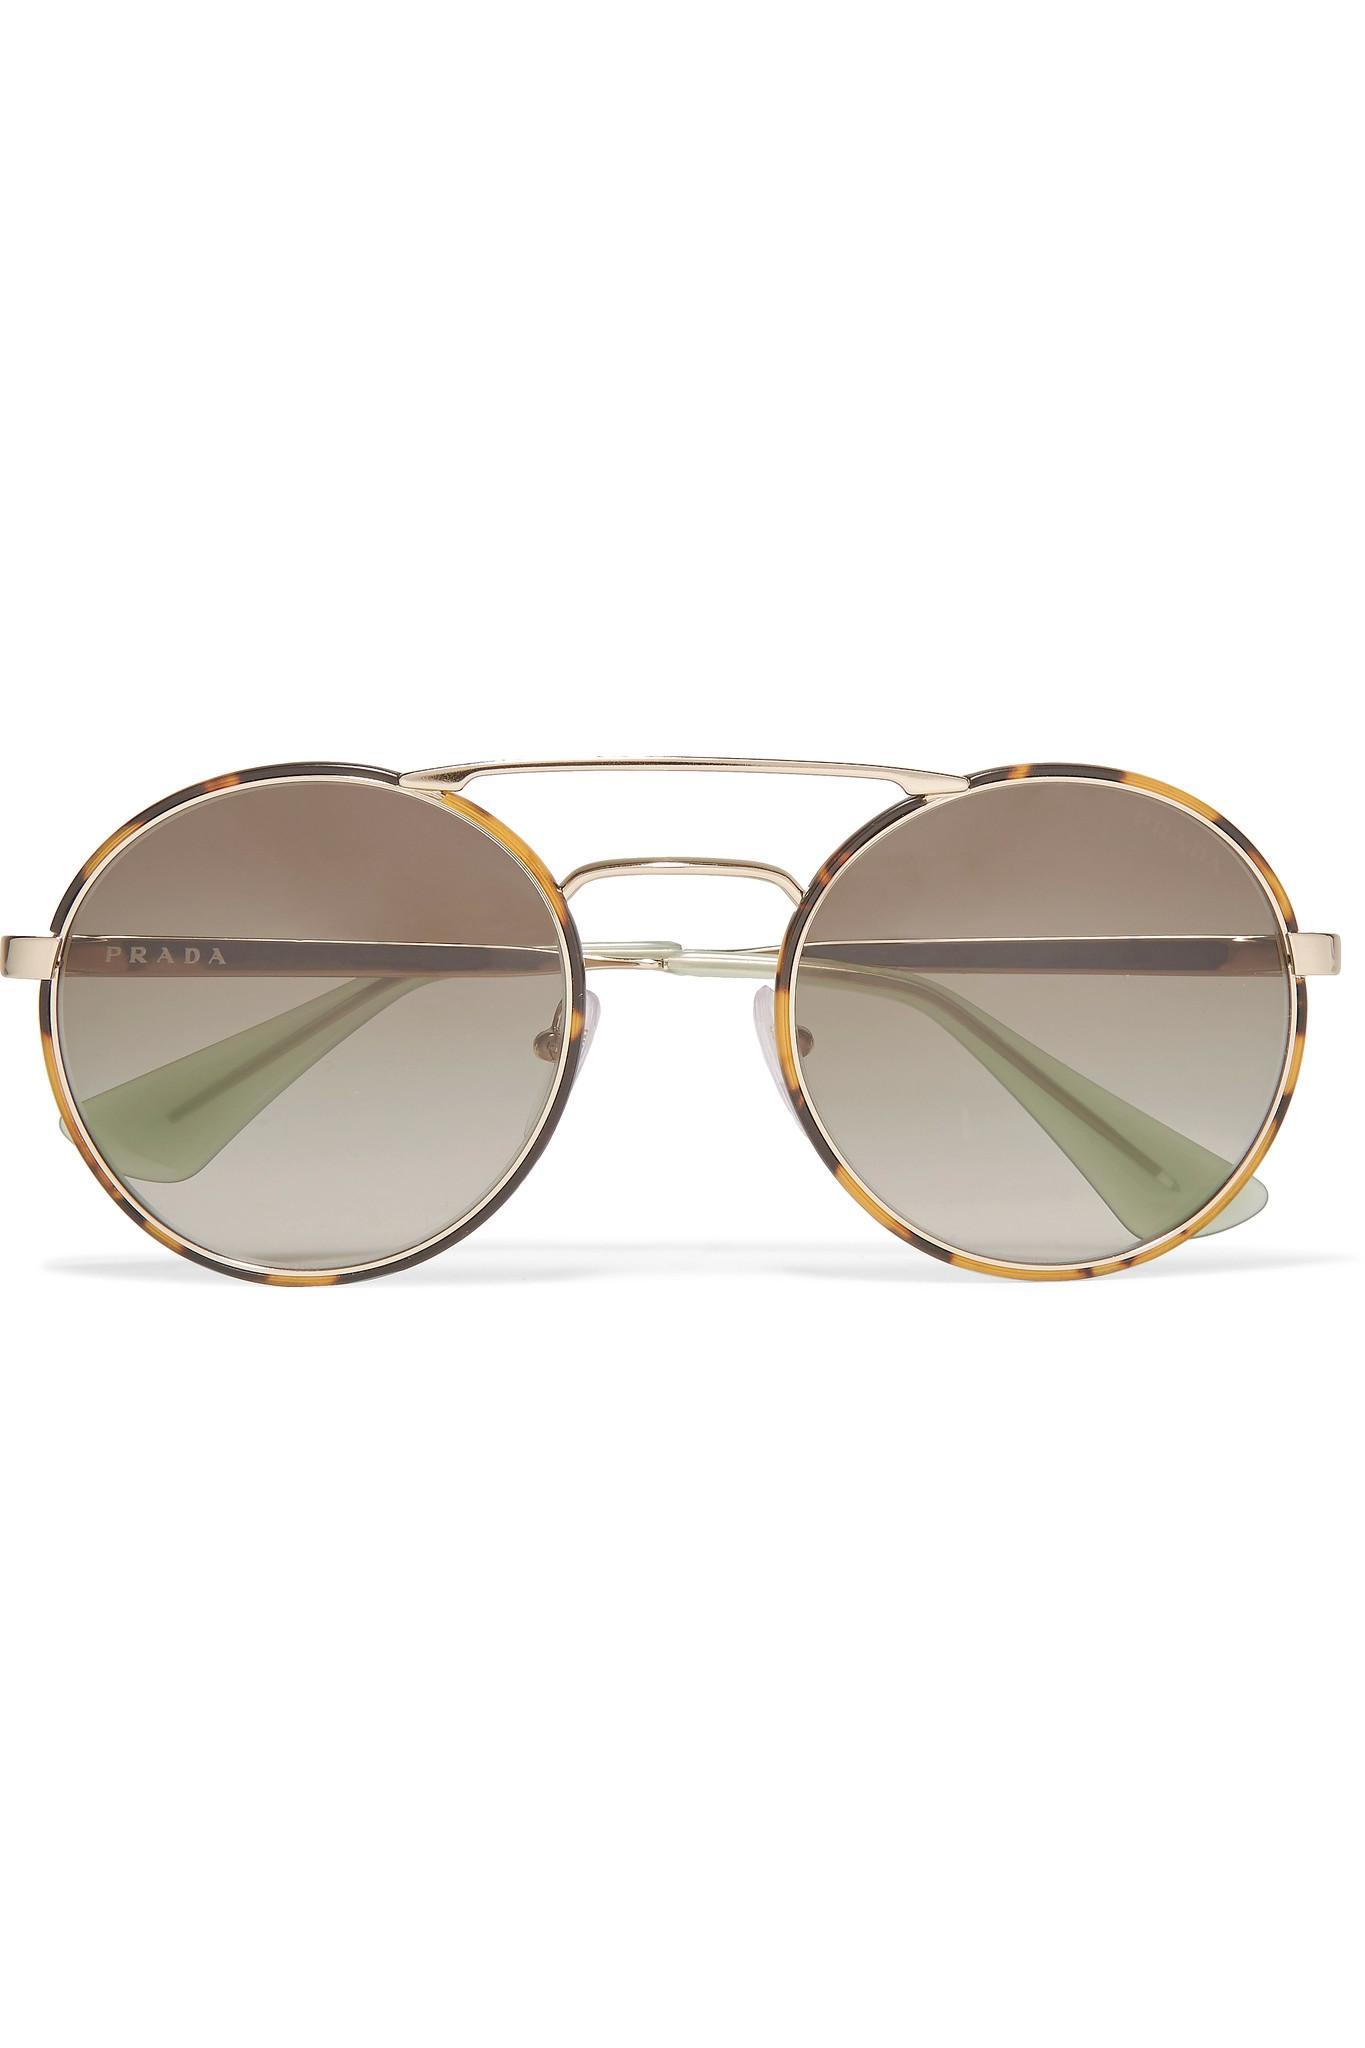 7d7cd9f909 Lyst - Prada Round-frame Tortoishell Acetate And Gold-tone Sunglasses in  Metallic